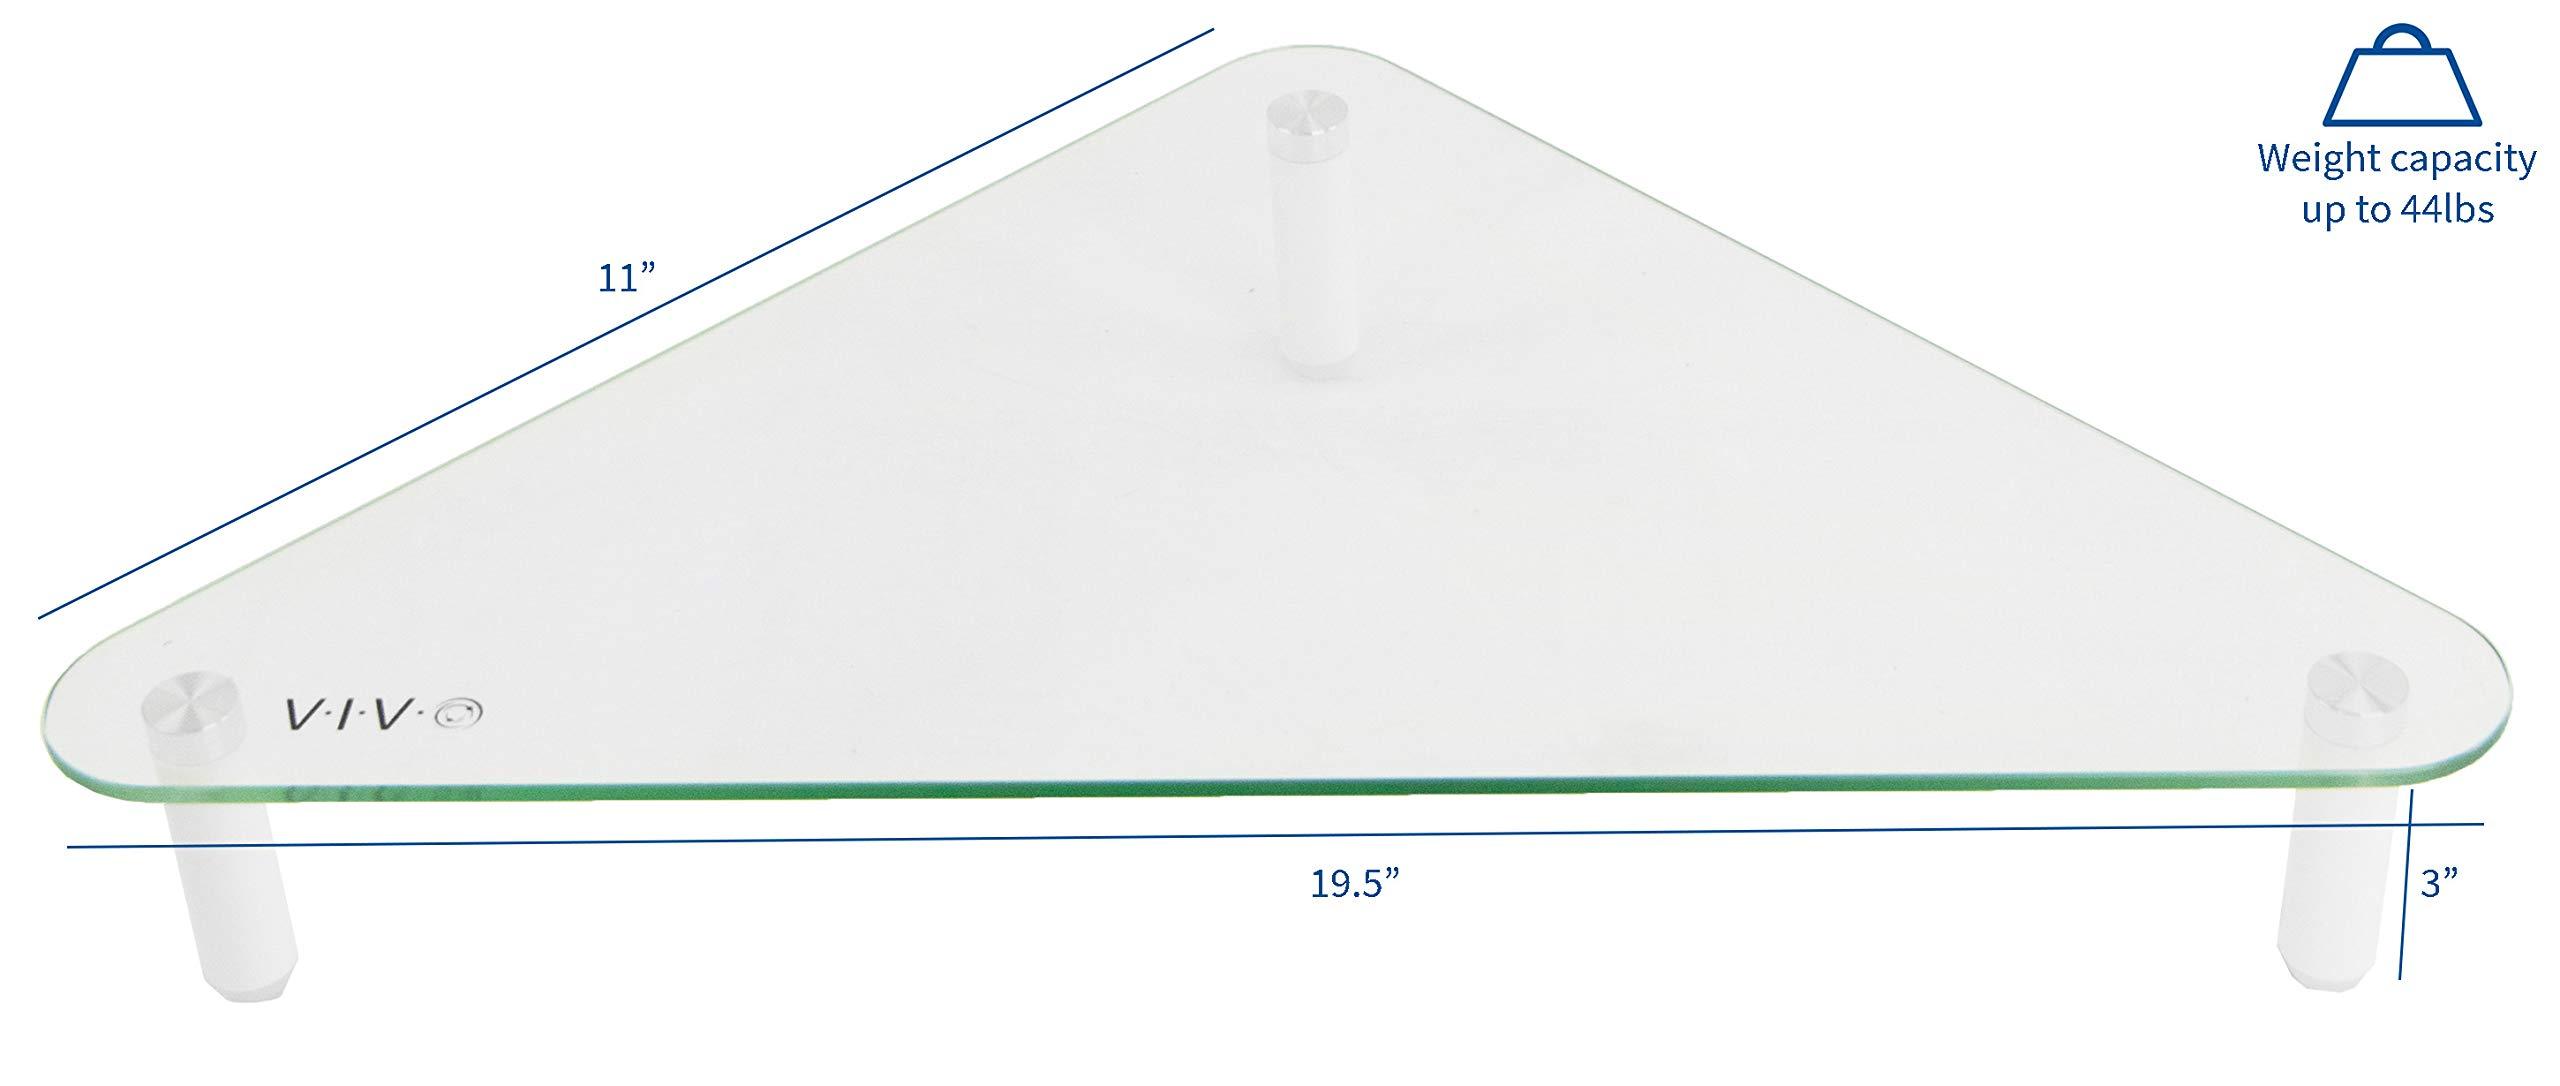 VIVO Glass Ergonomic Tabletop Riser | Triangle Desktop Universal Corner Stand for Computer Monitor & Laptop (STAND-V000Q) by VIVO (Image #2)